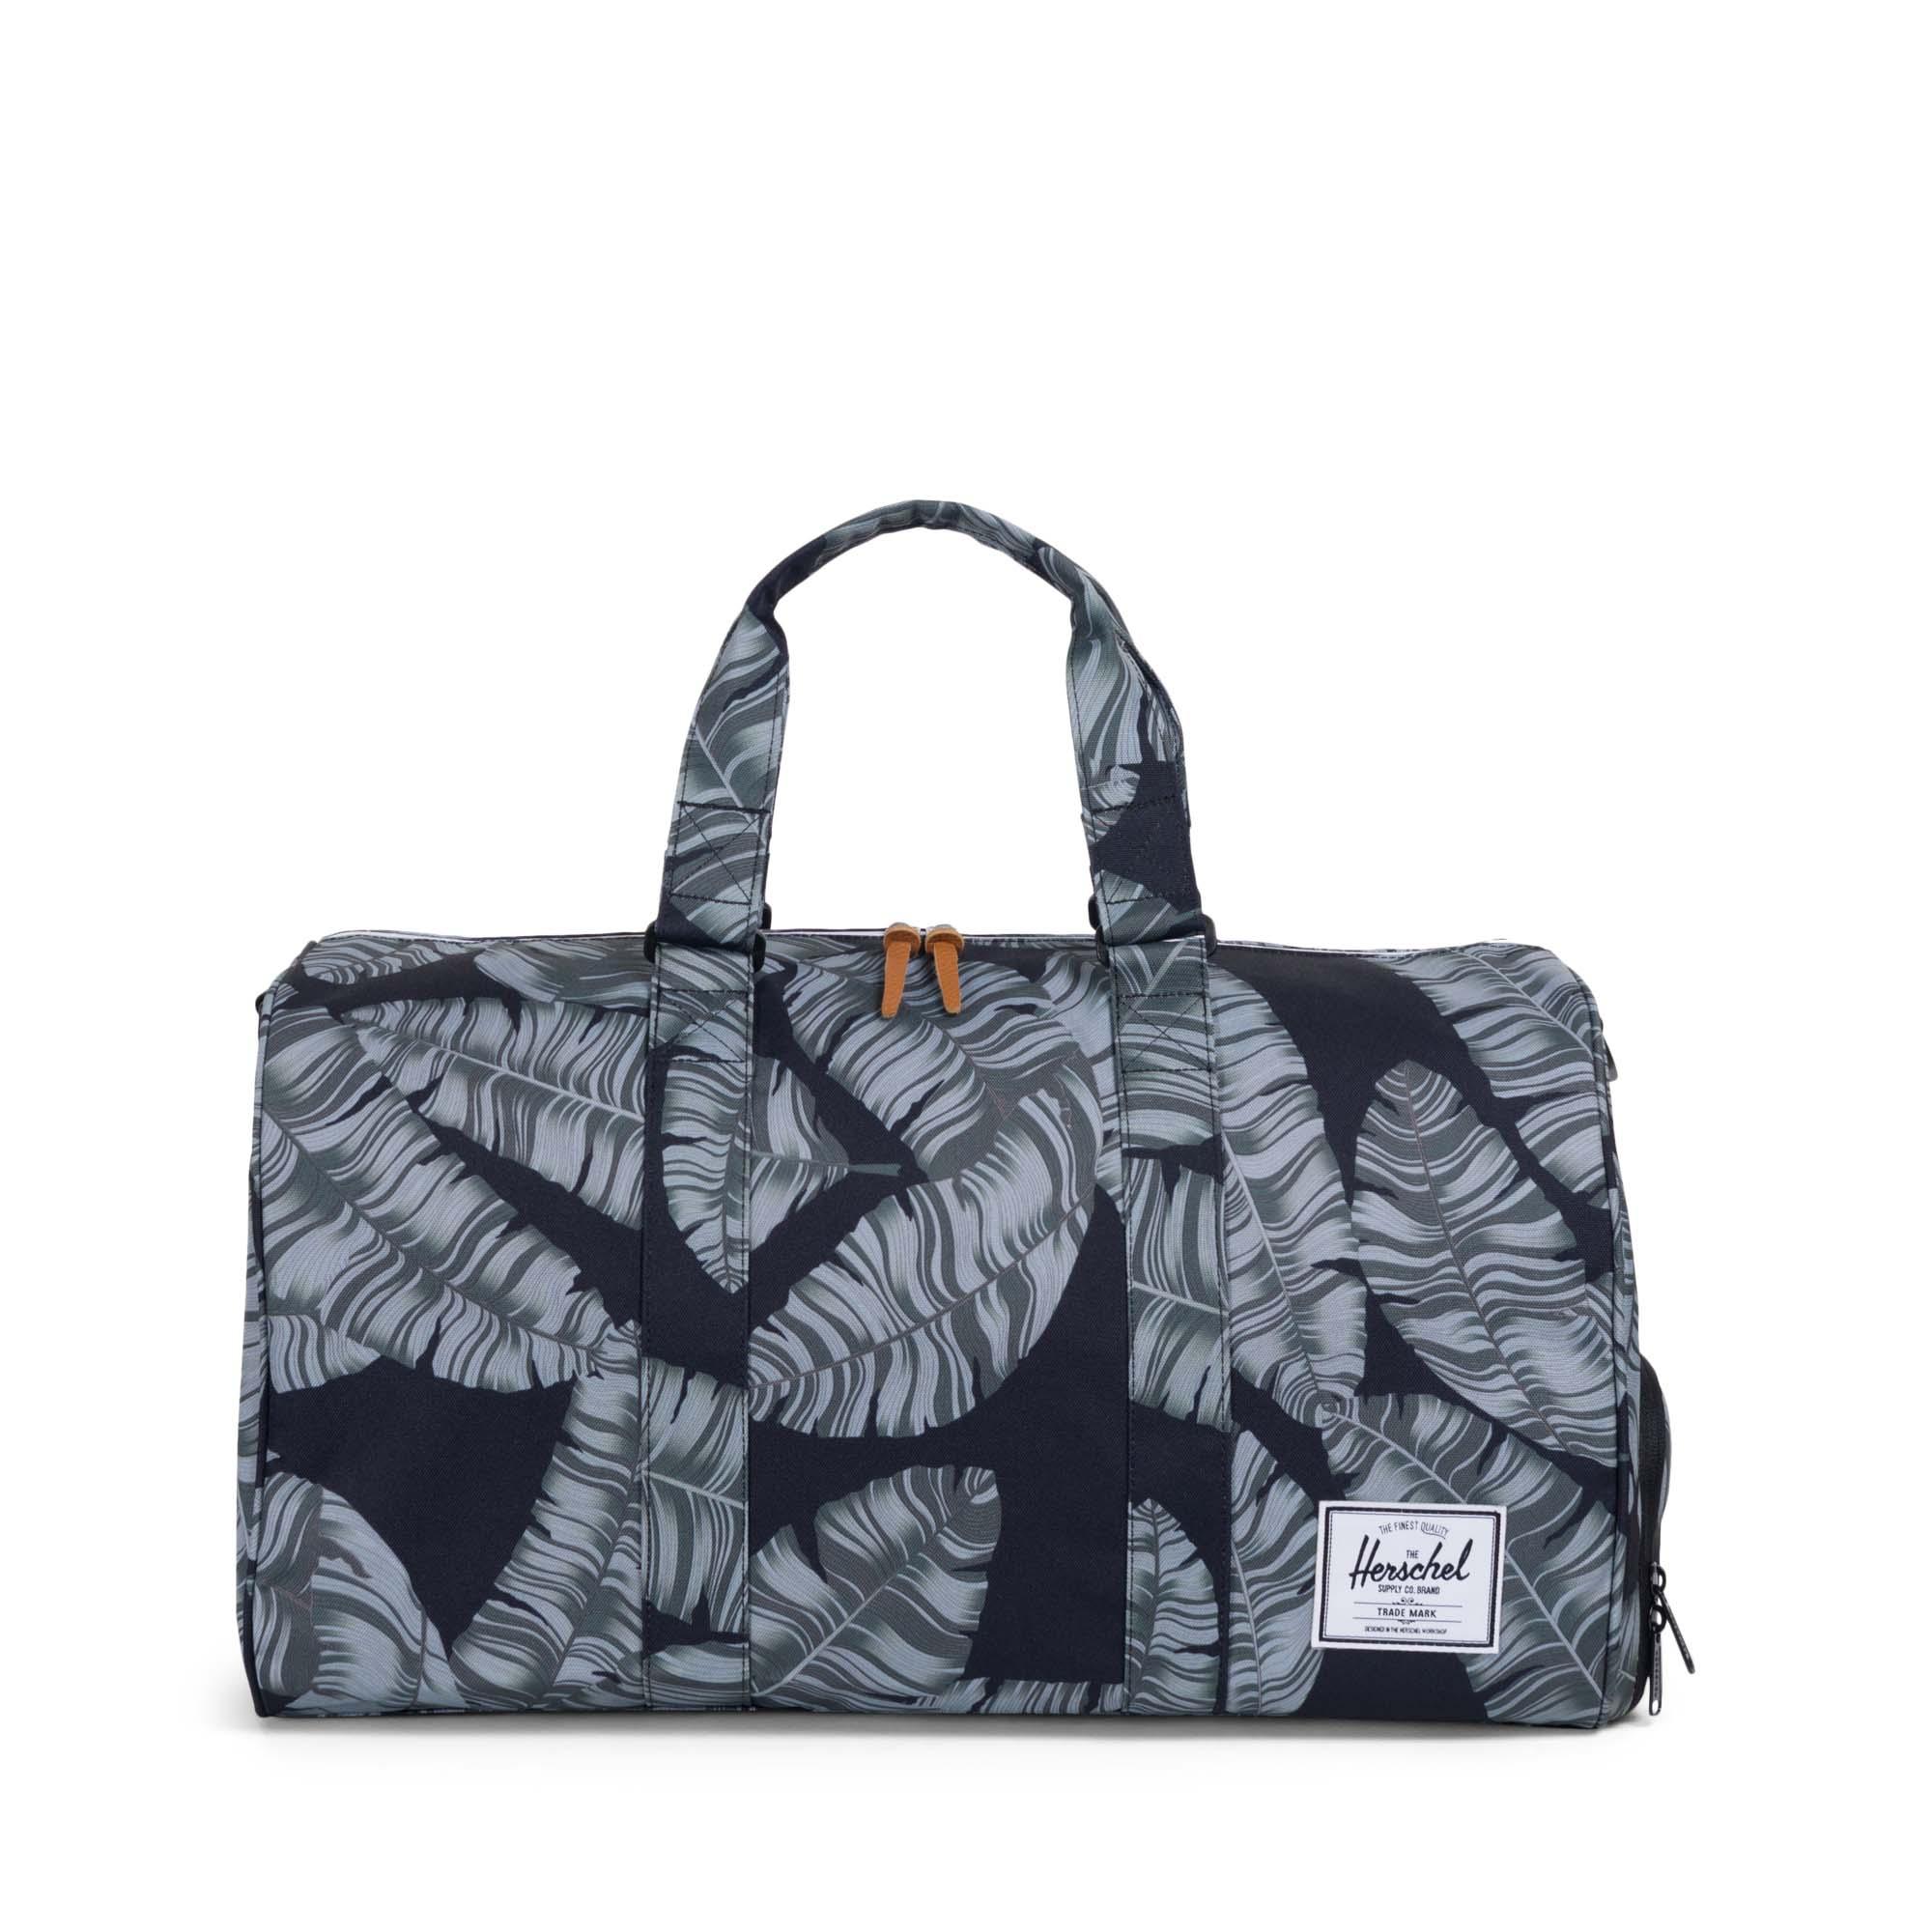 0cb8e5dd58d6 Herschel Novel 42.5 Litre Duffle Carry Bag Black Palm. Our Price  £59.95